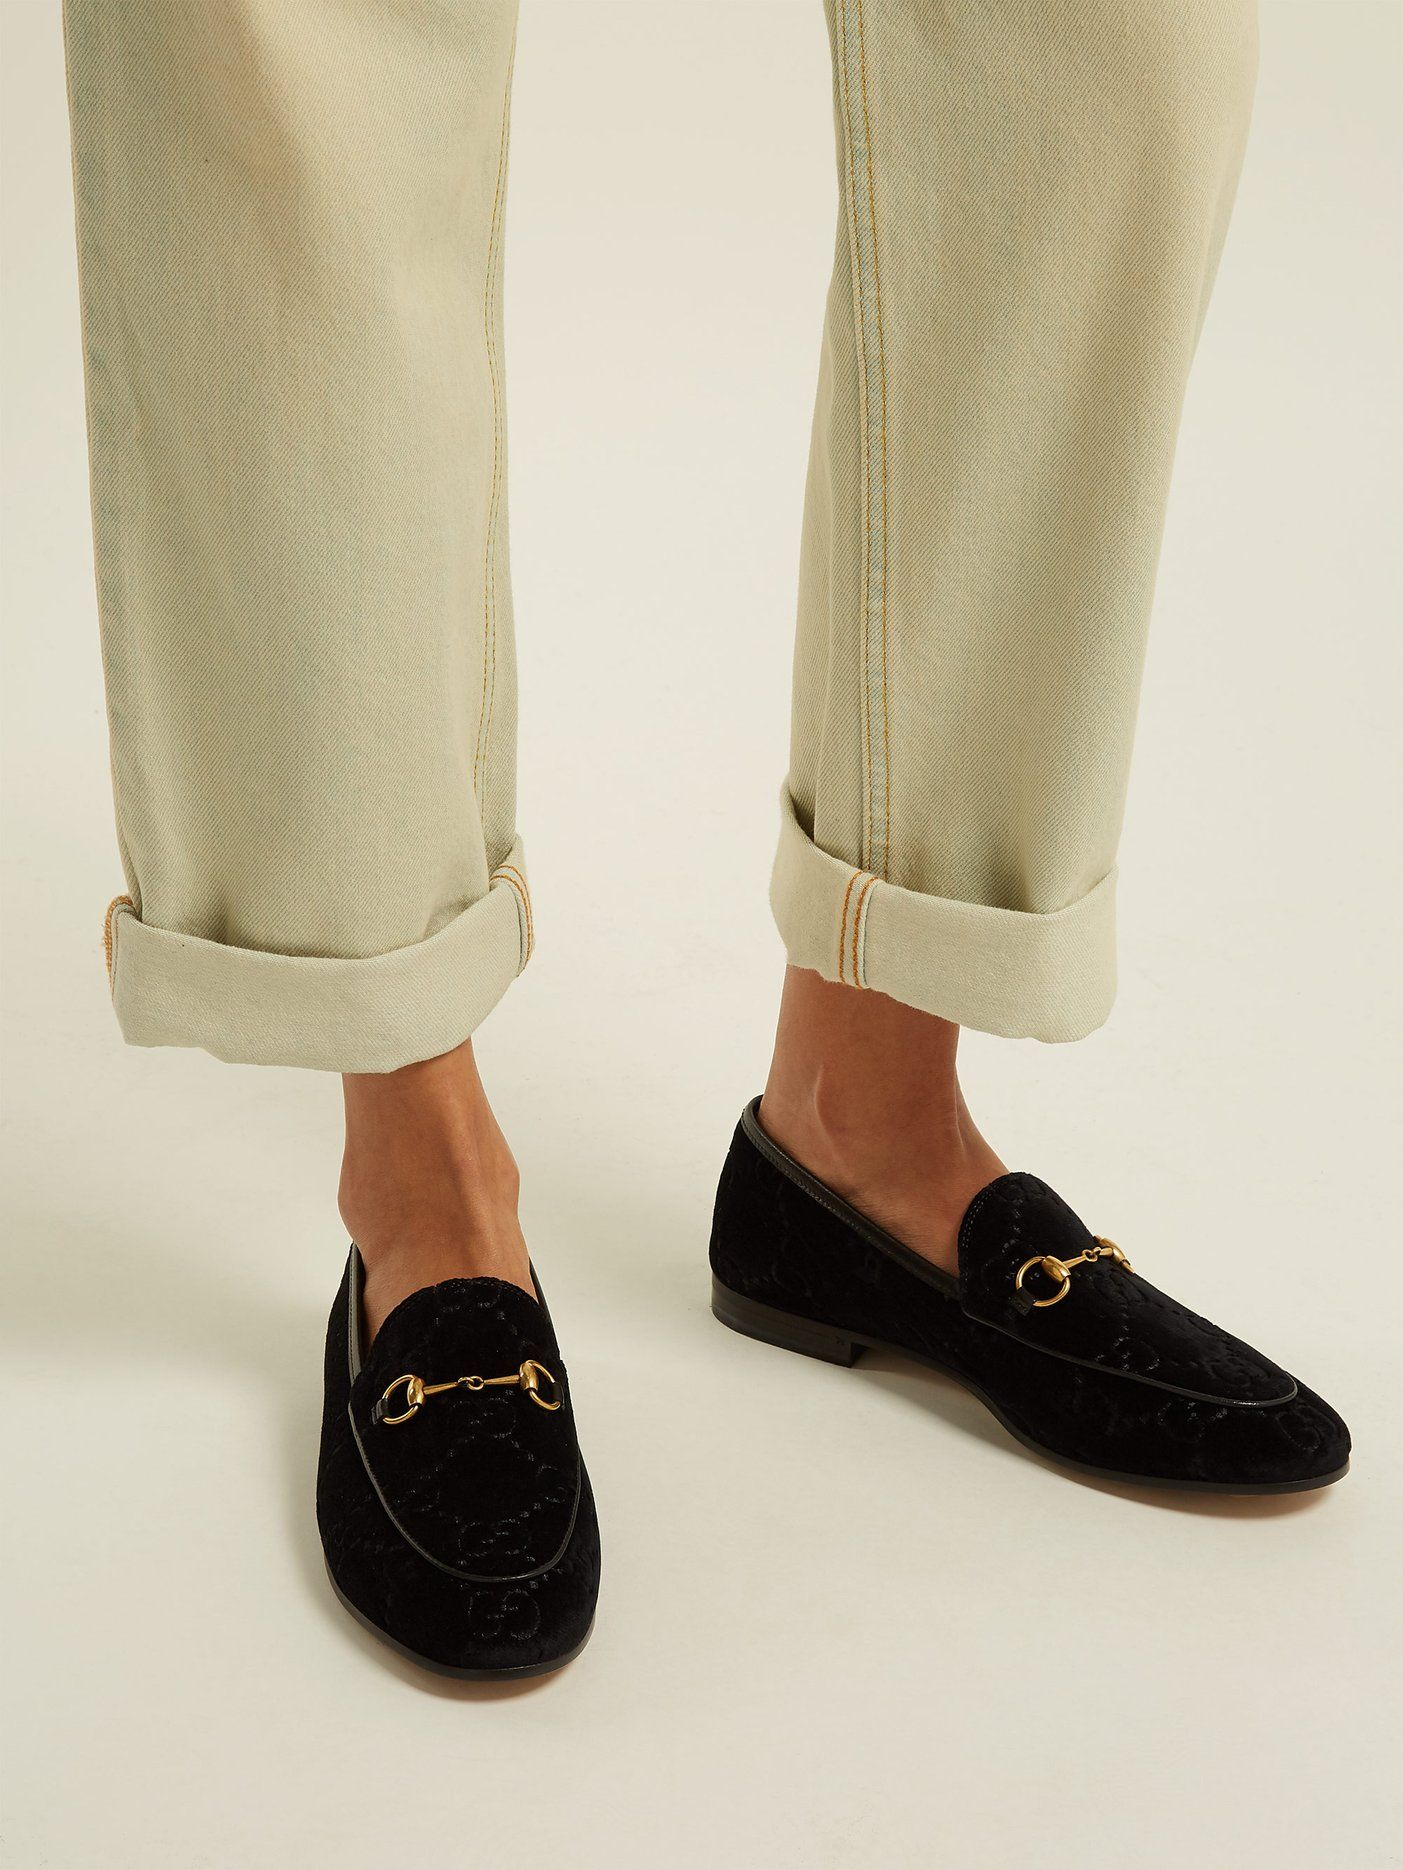 d0deb63ffa9 Jordaan GG velvet loafers